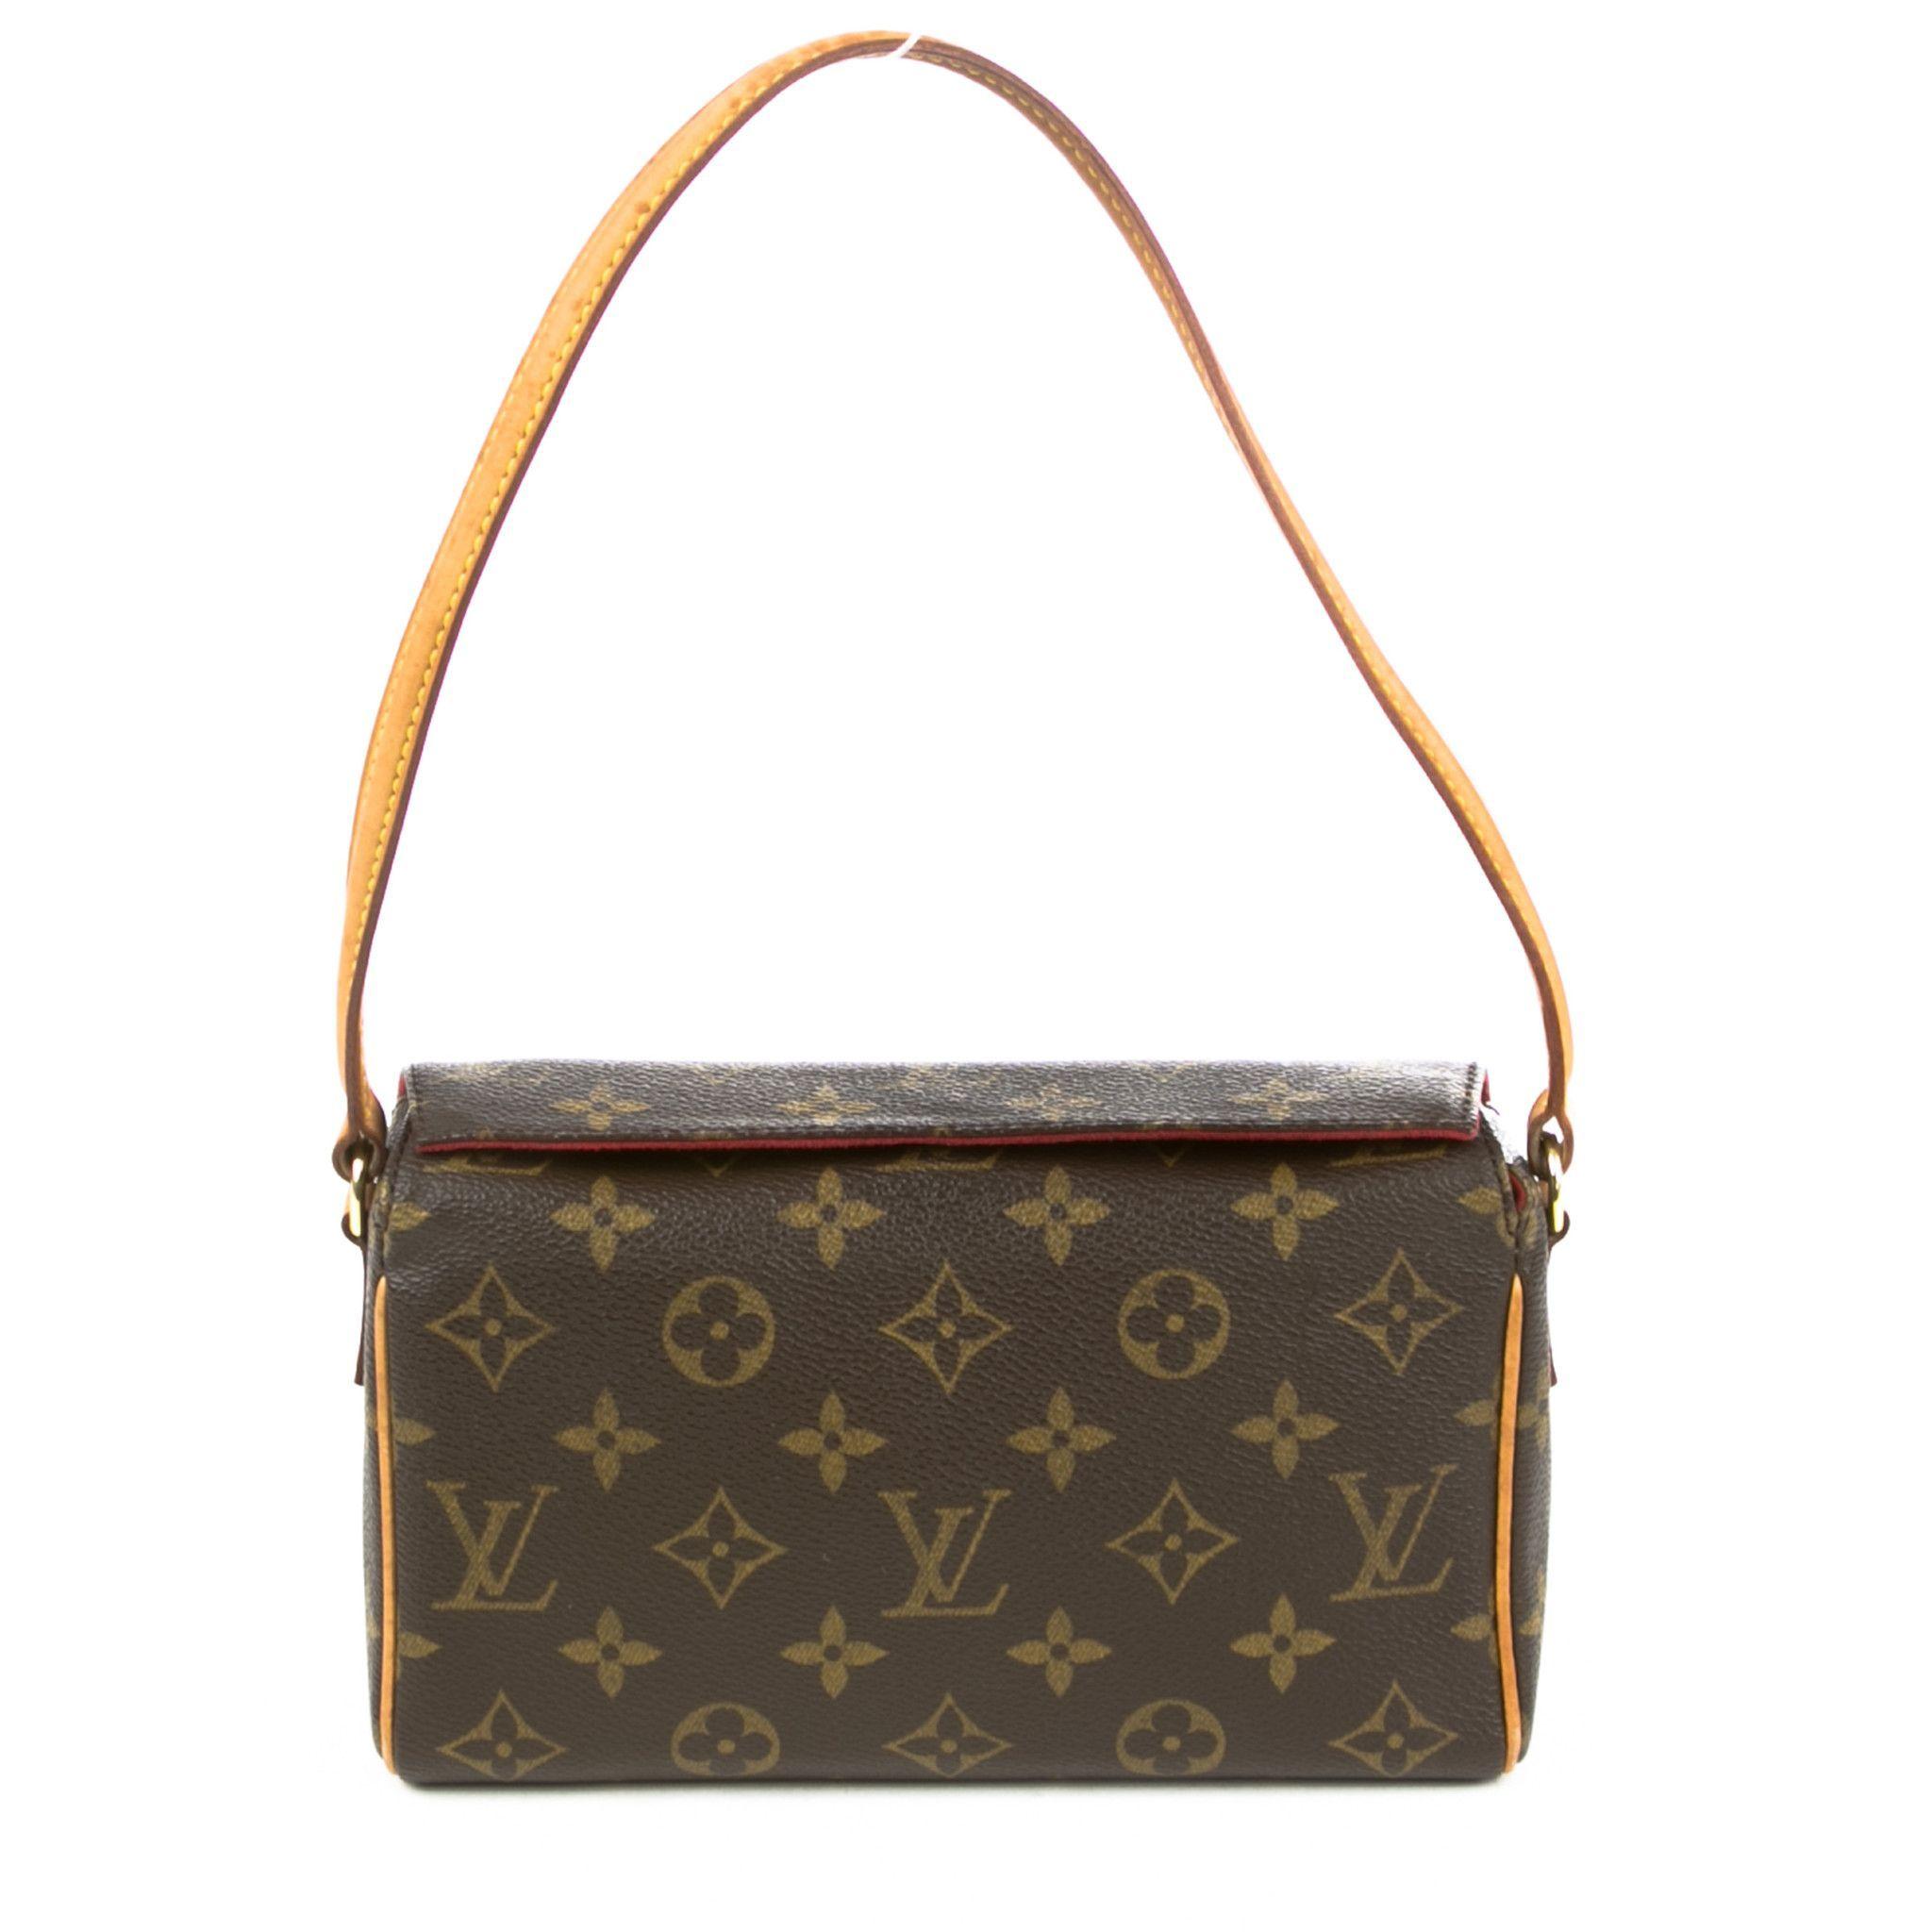 Louis Vuitton Recital Handbag Authentic Pre Owned